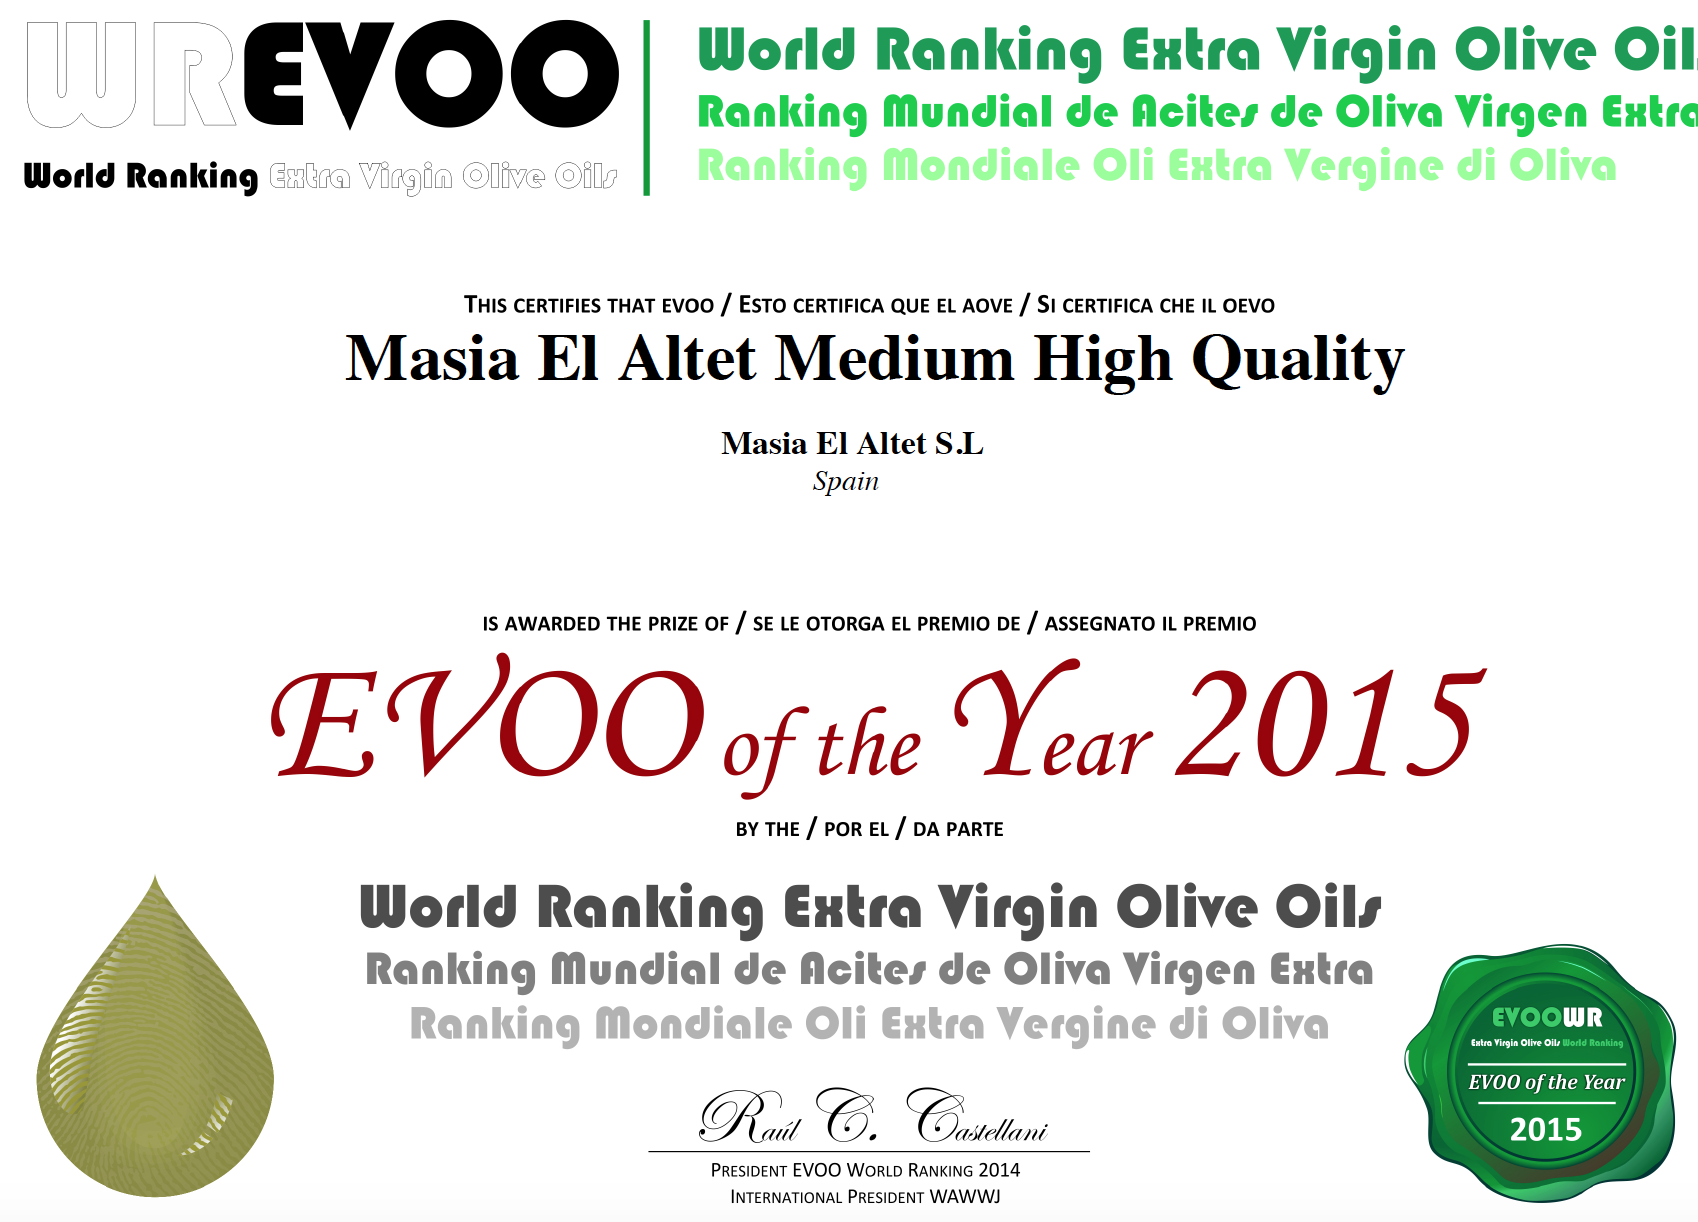 TOP 50 MEJORES ACEITES DE OLIVA VIRGENES EXTRA DEL MUNDO (HIGH QUALITY)